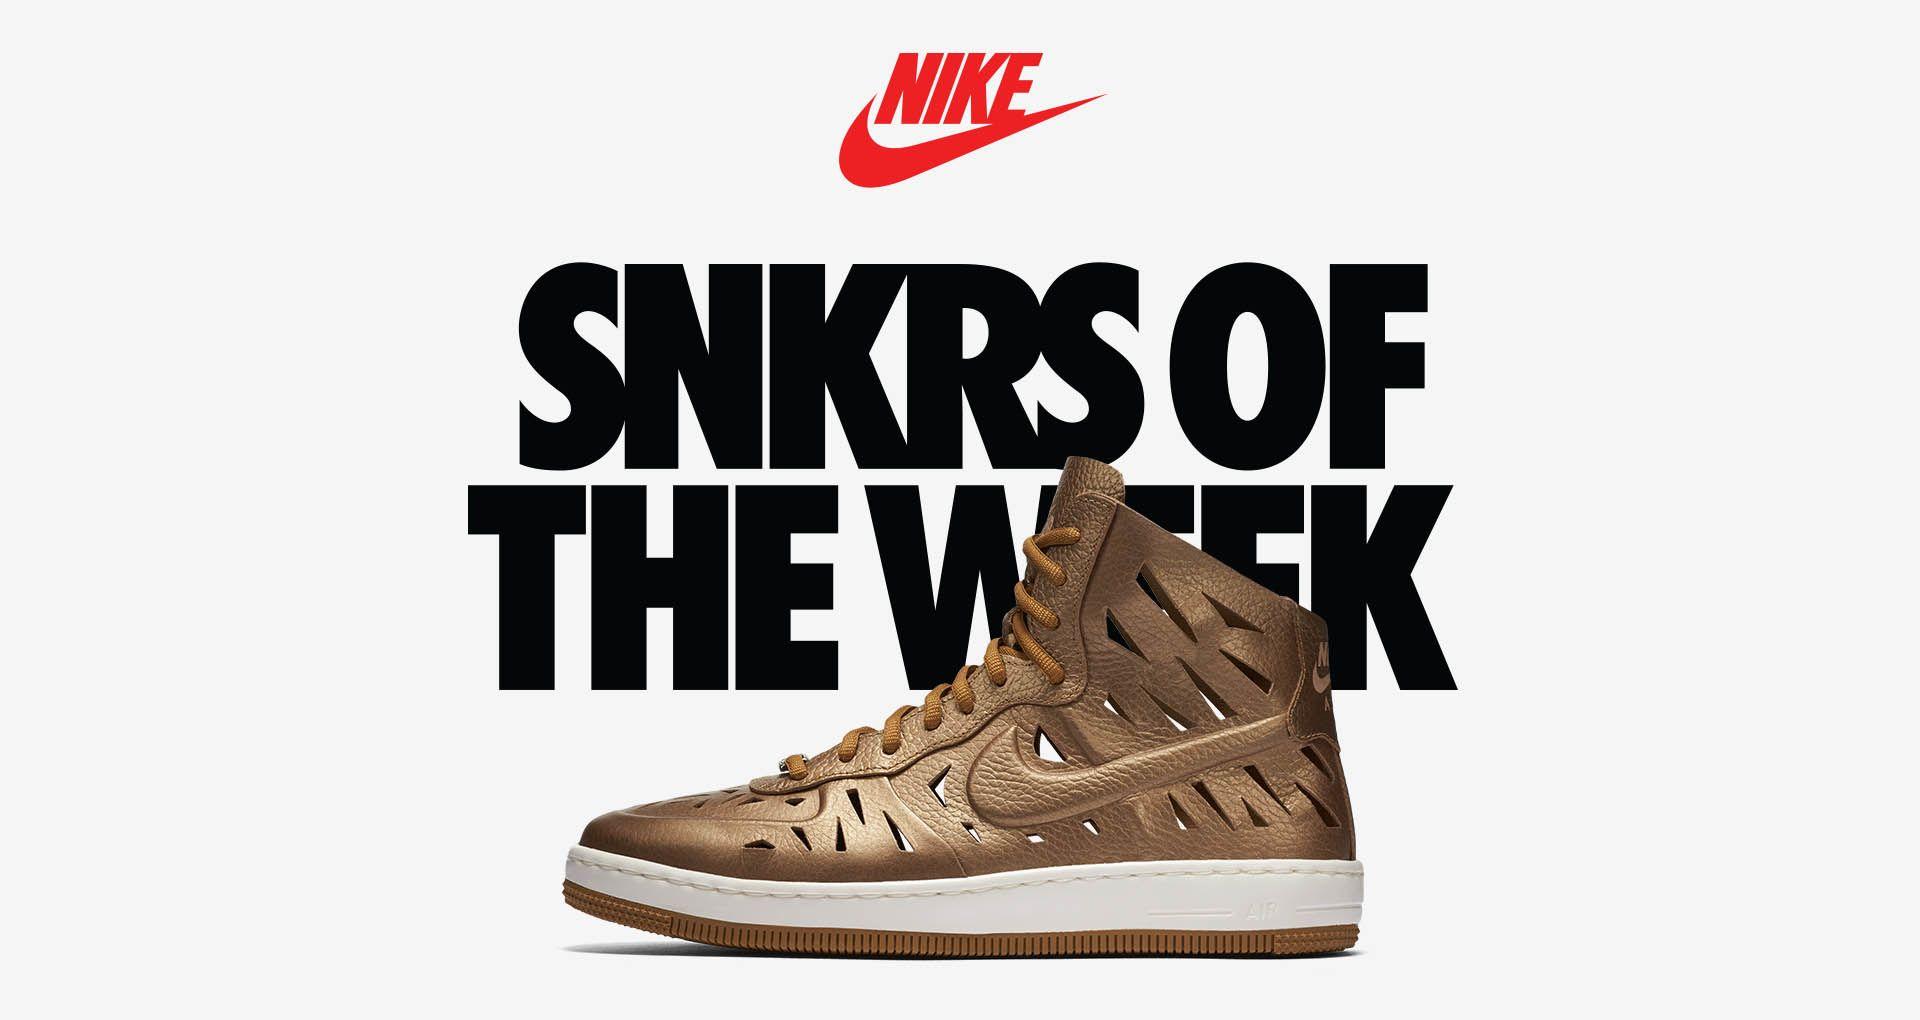 check out dbf90 6601e Women s Nike Air Force 1 Ultra Mid Joli  Metallic Golden Tan  Release Date.  Nike+ SNKRS